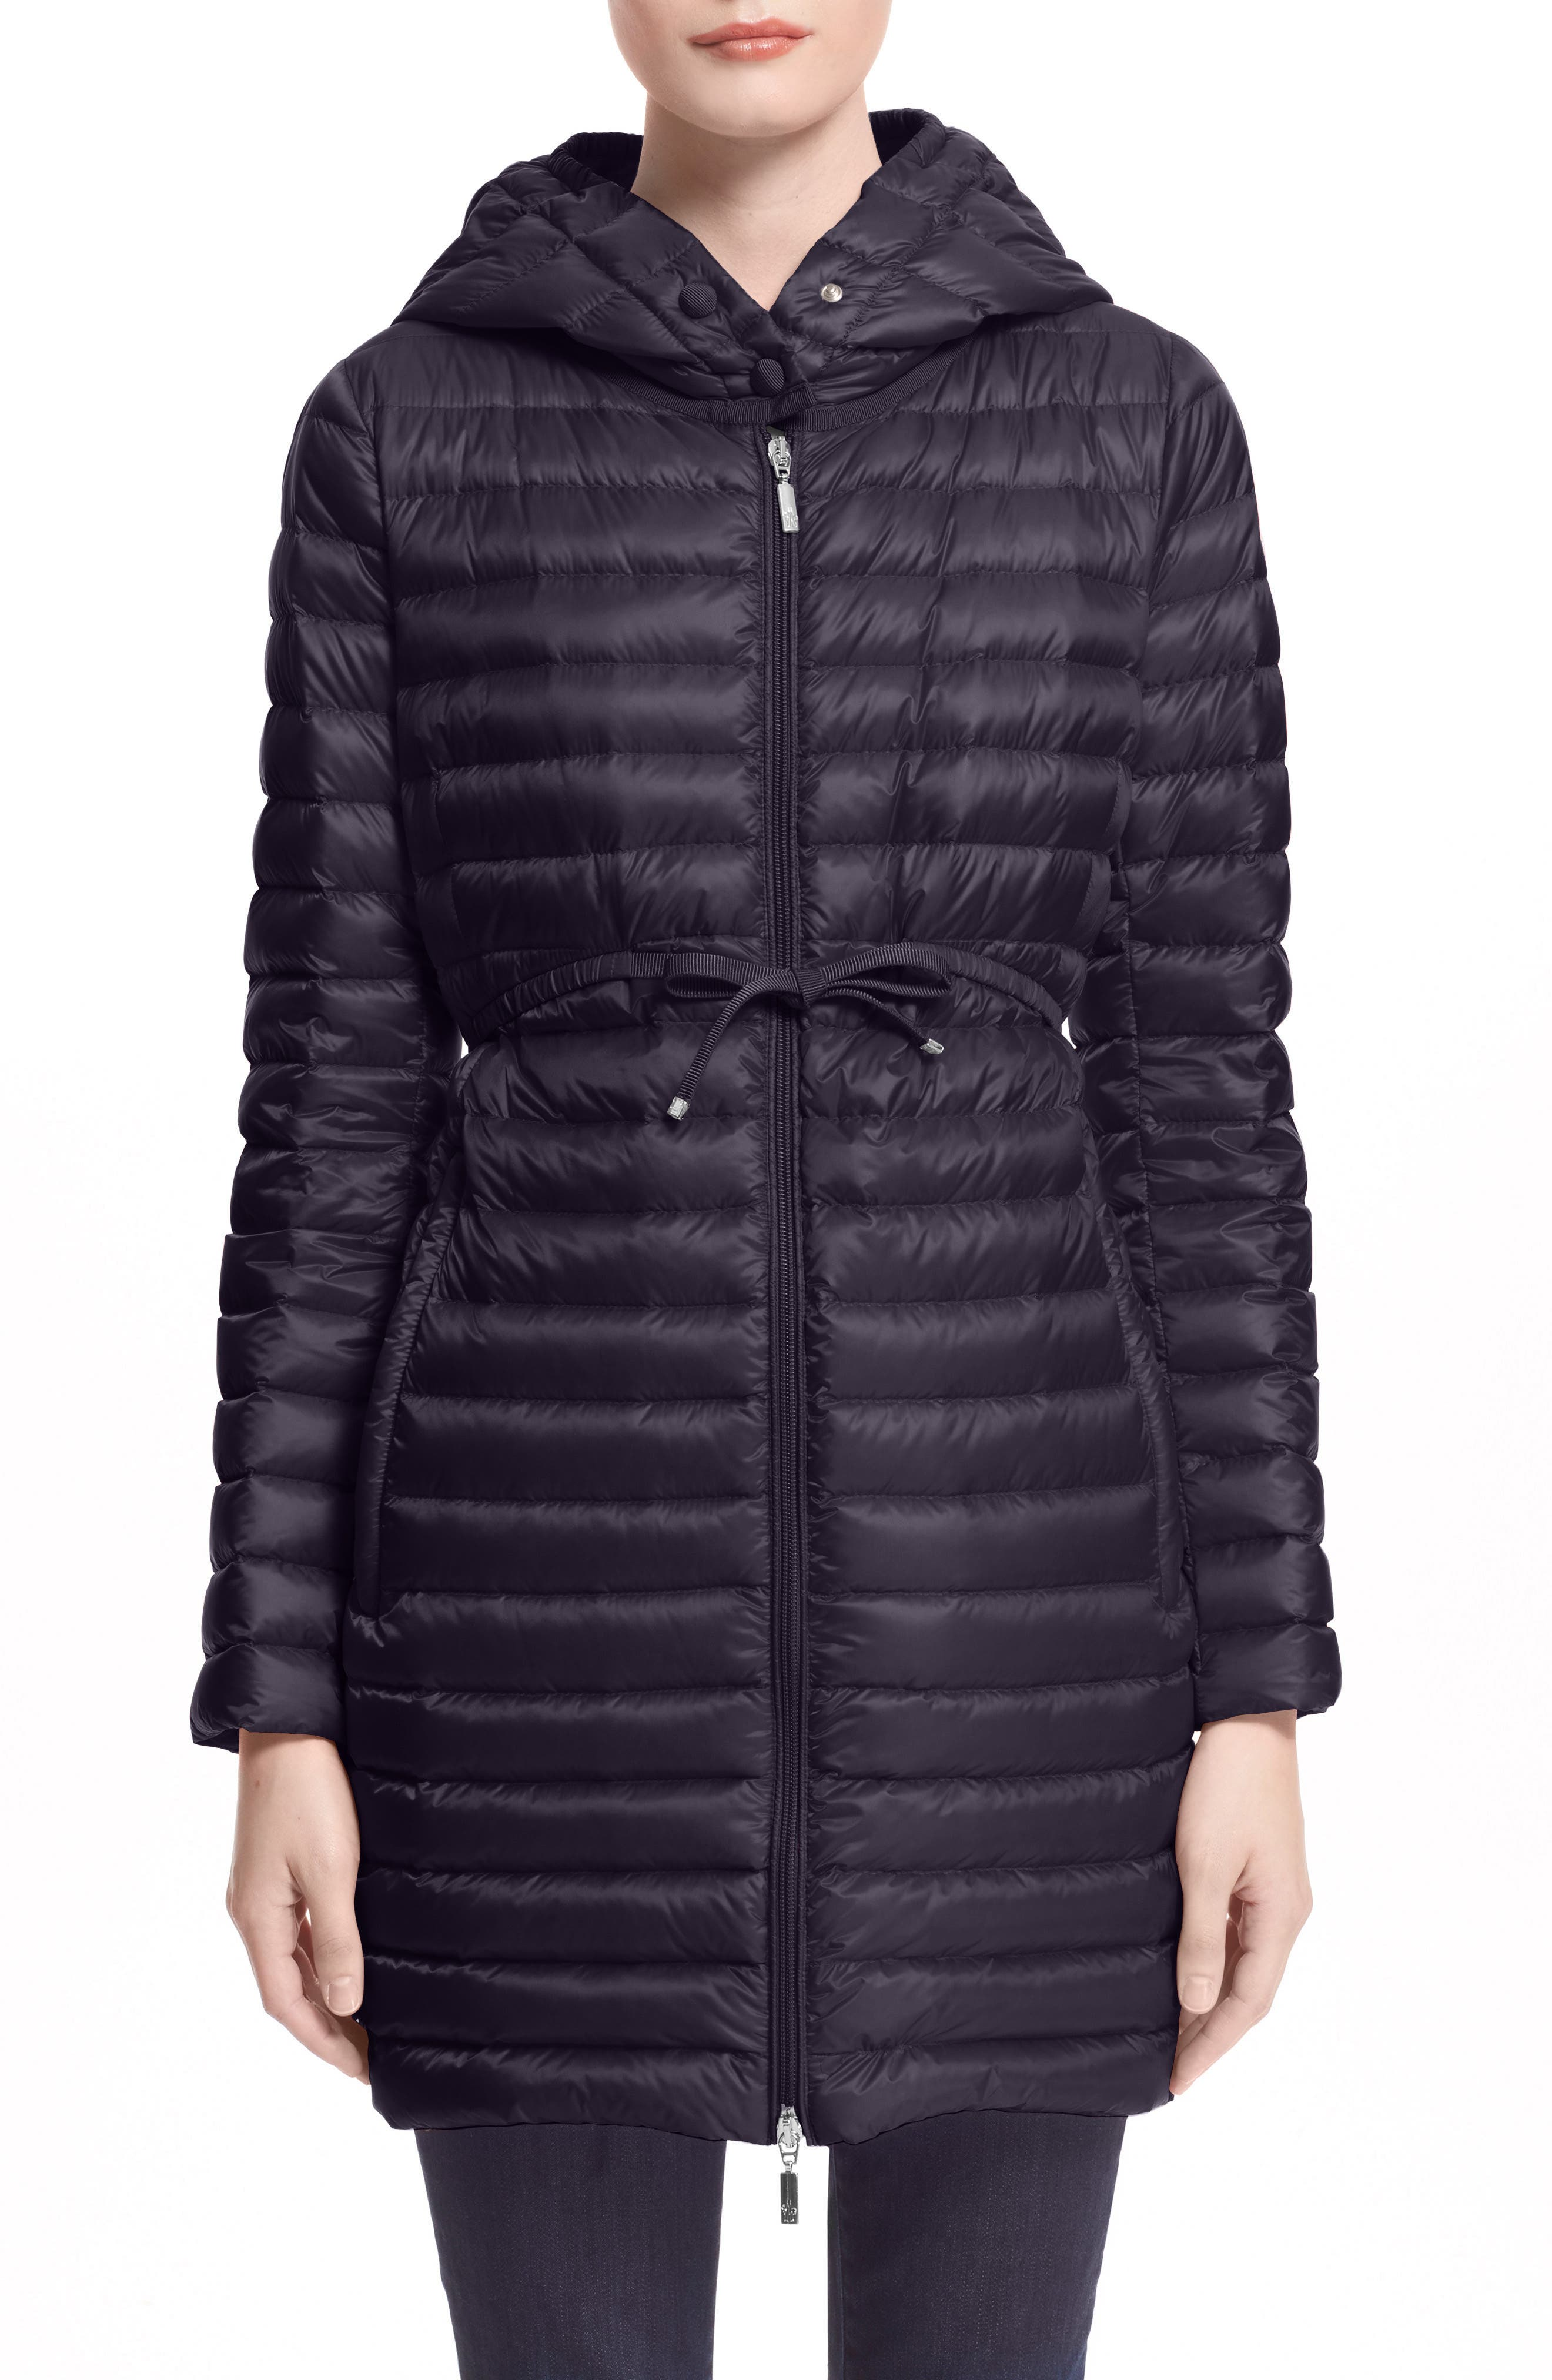 Main Image - Moncler Barbel Water Resistant Long Hooded Down Jacket